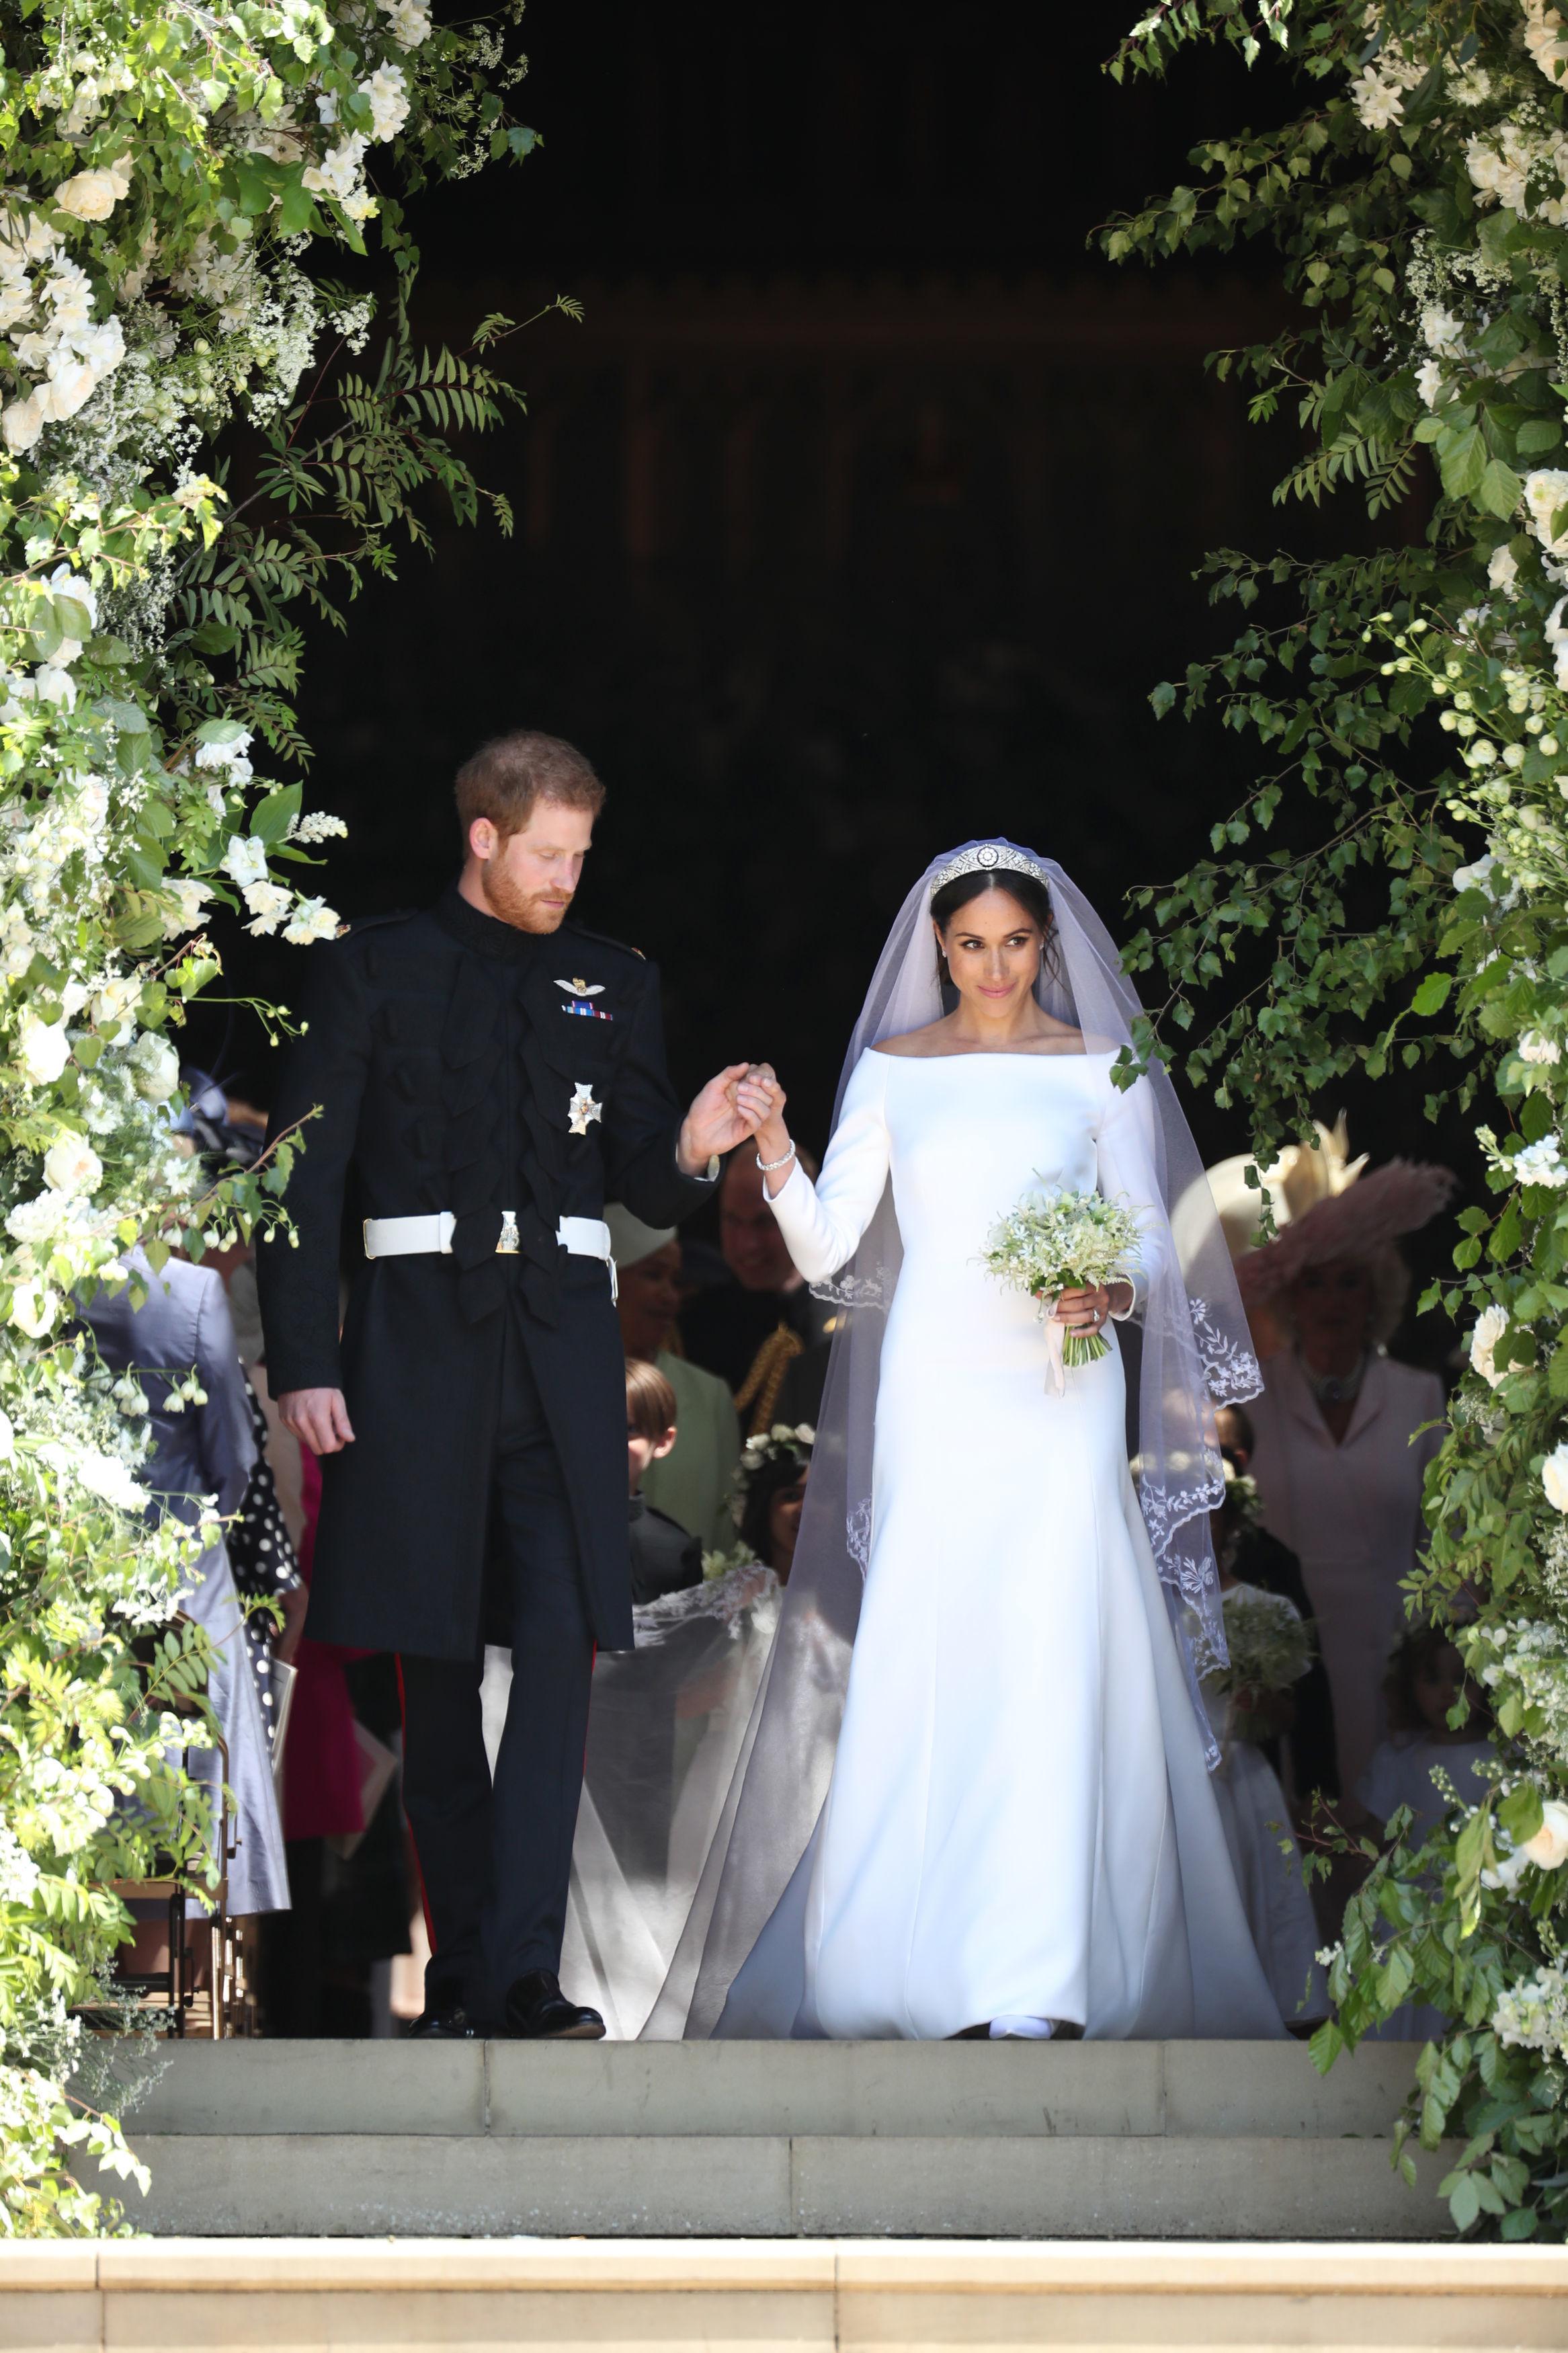 Prince Harry and Meghan Markle Leaving Church